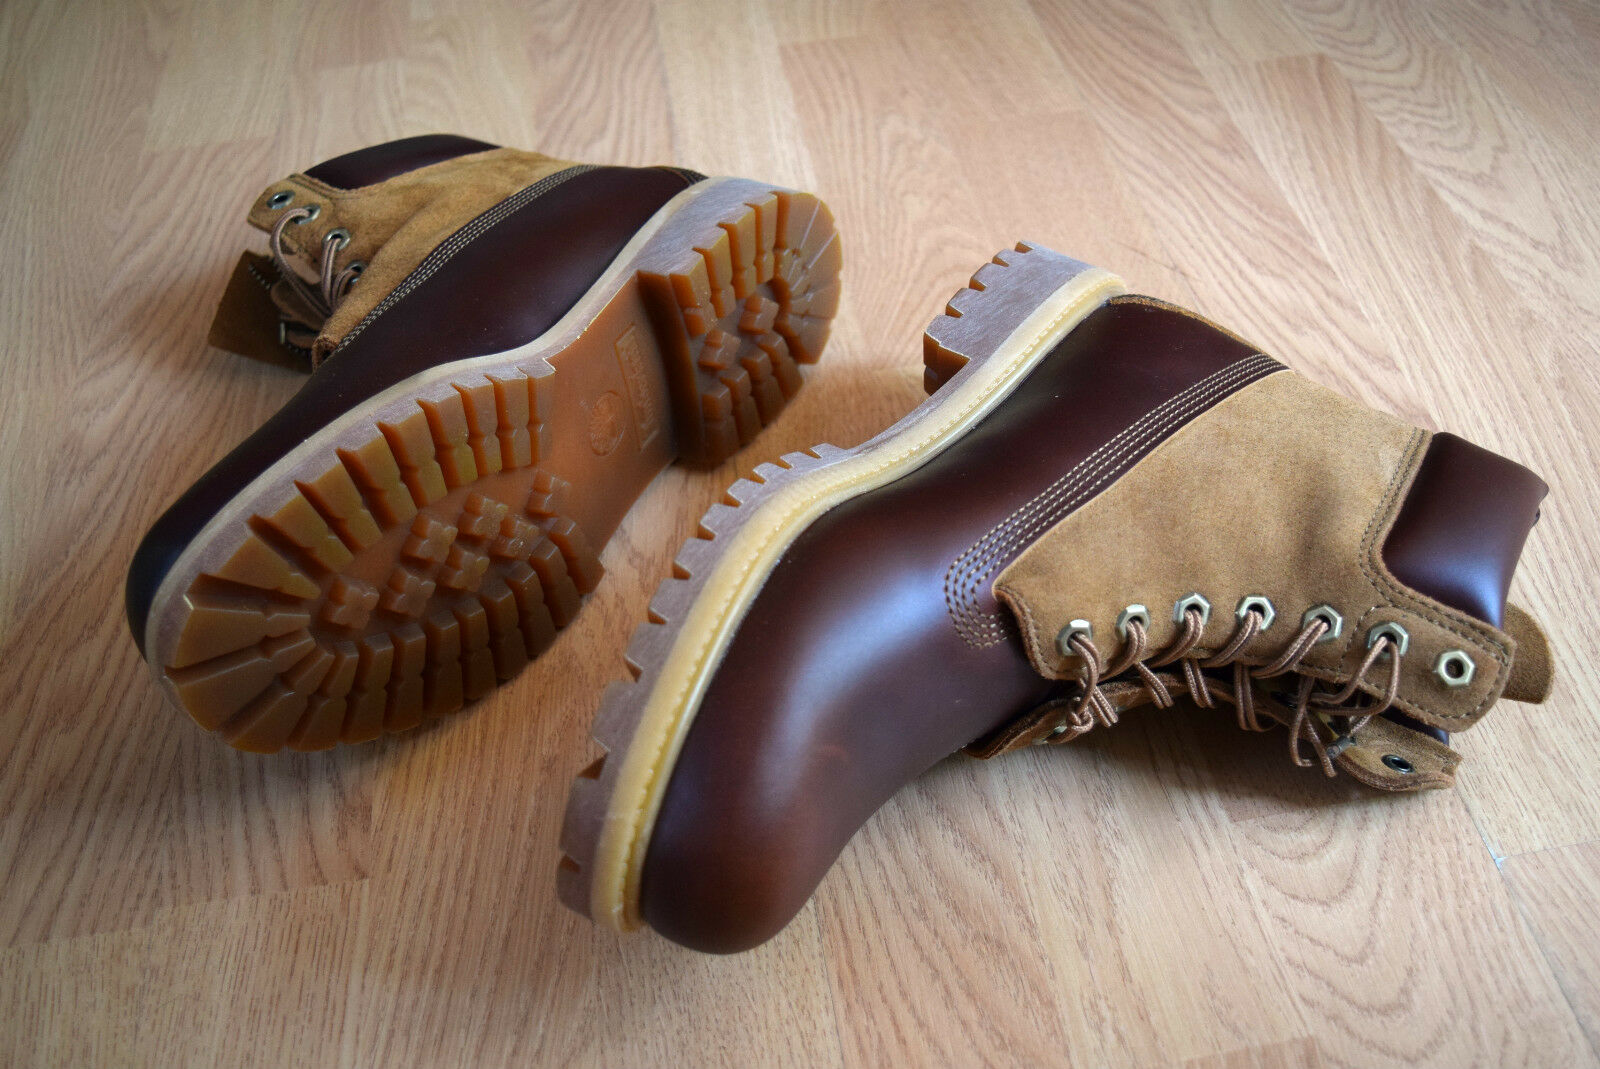 Timberland Premium 6 Inch FG 41 41,5 42 44 44,5 Stiefel